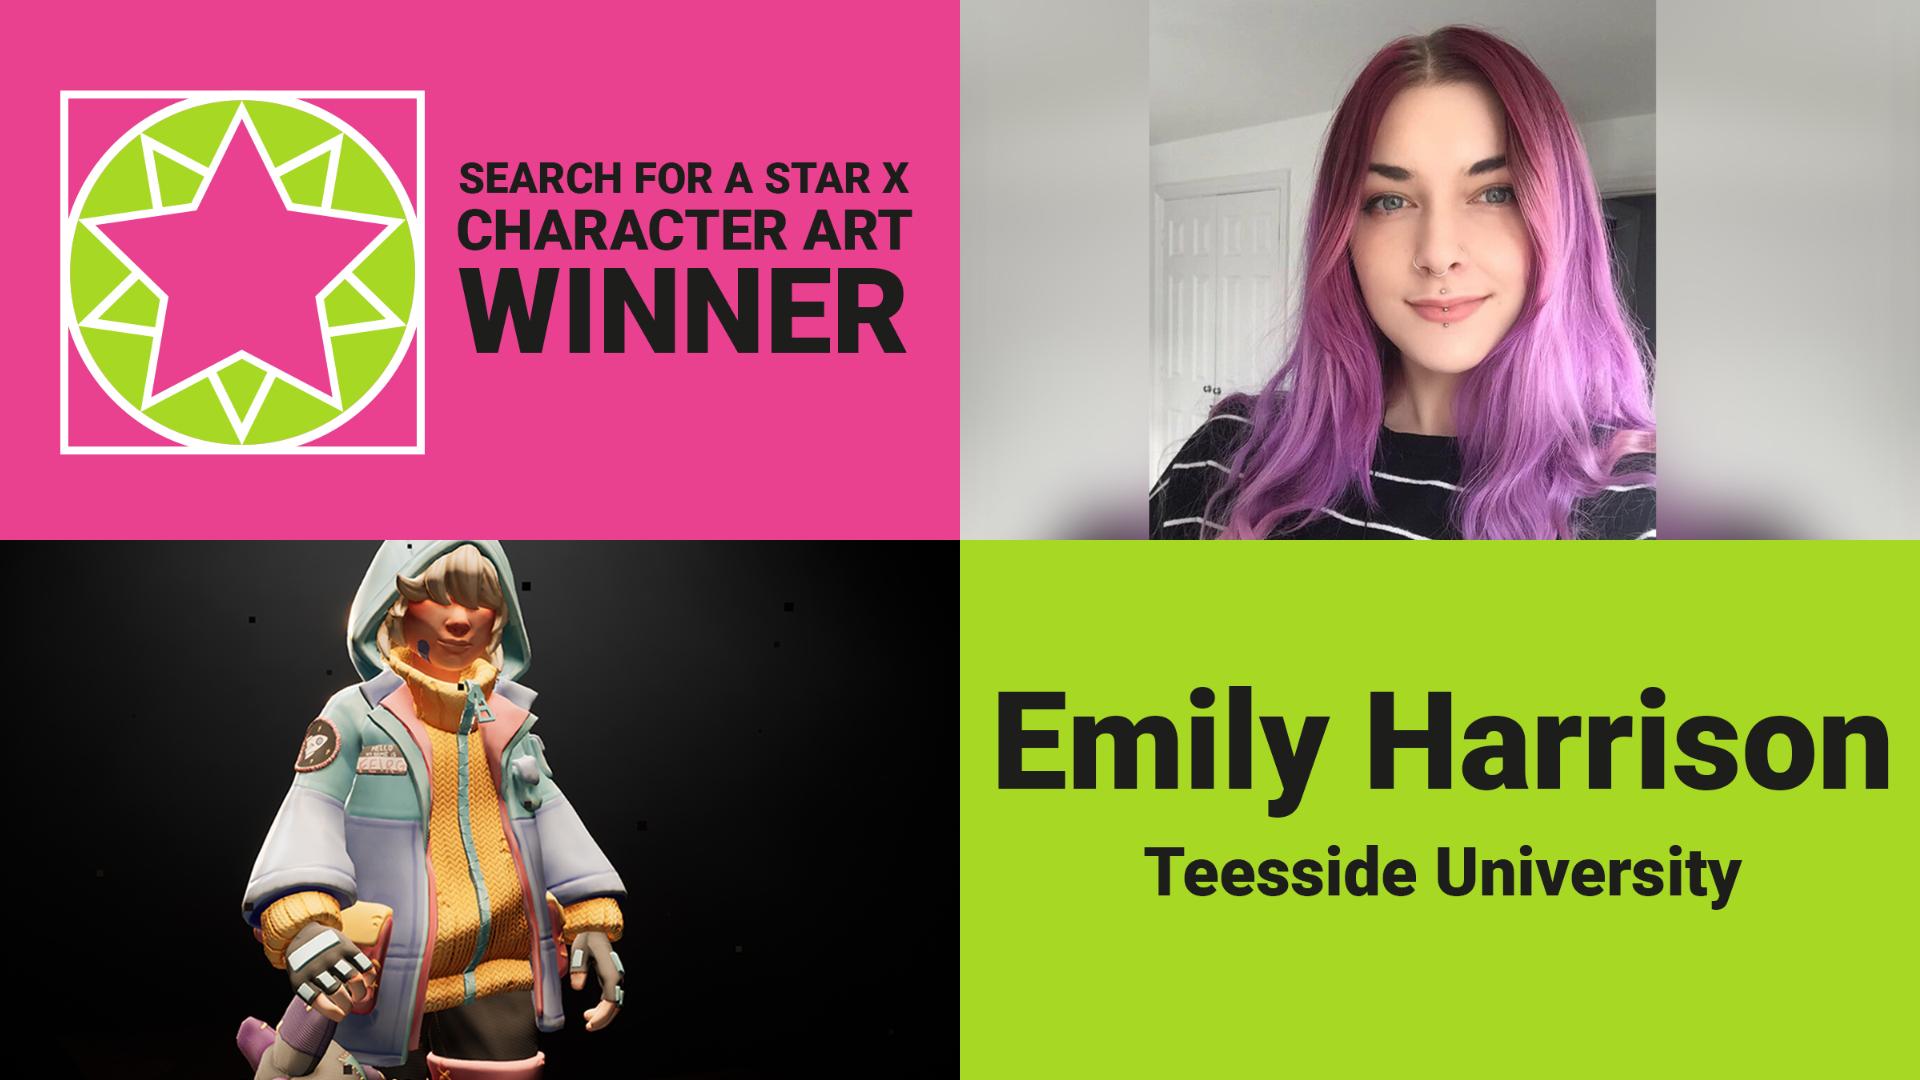 Emily Harrison - SFASX Winner Character Art